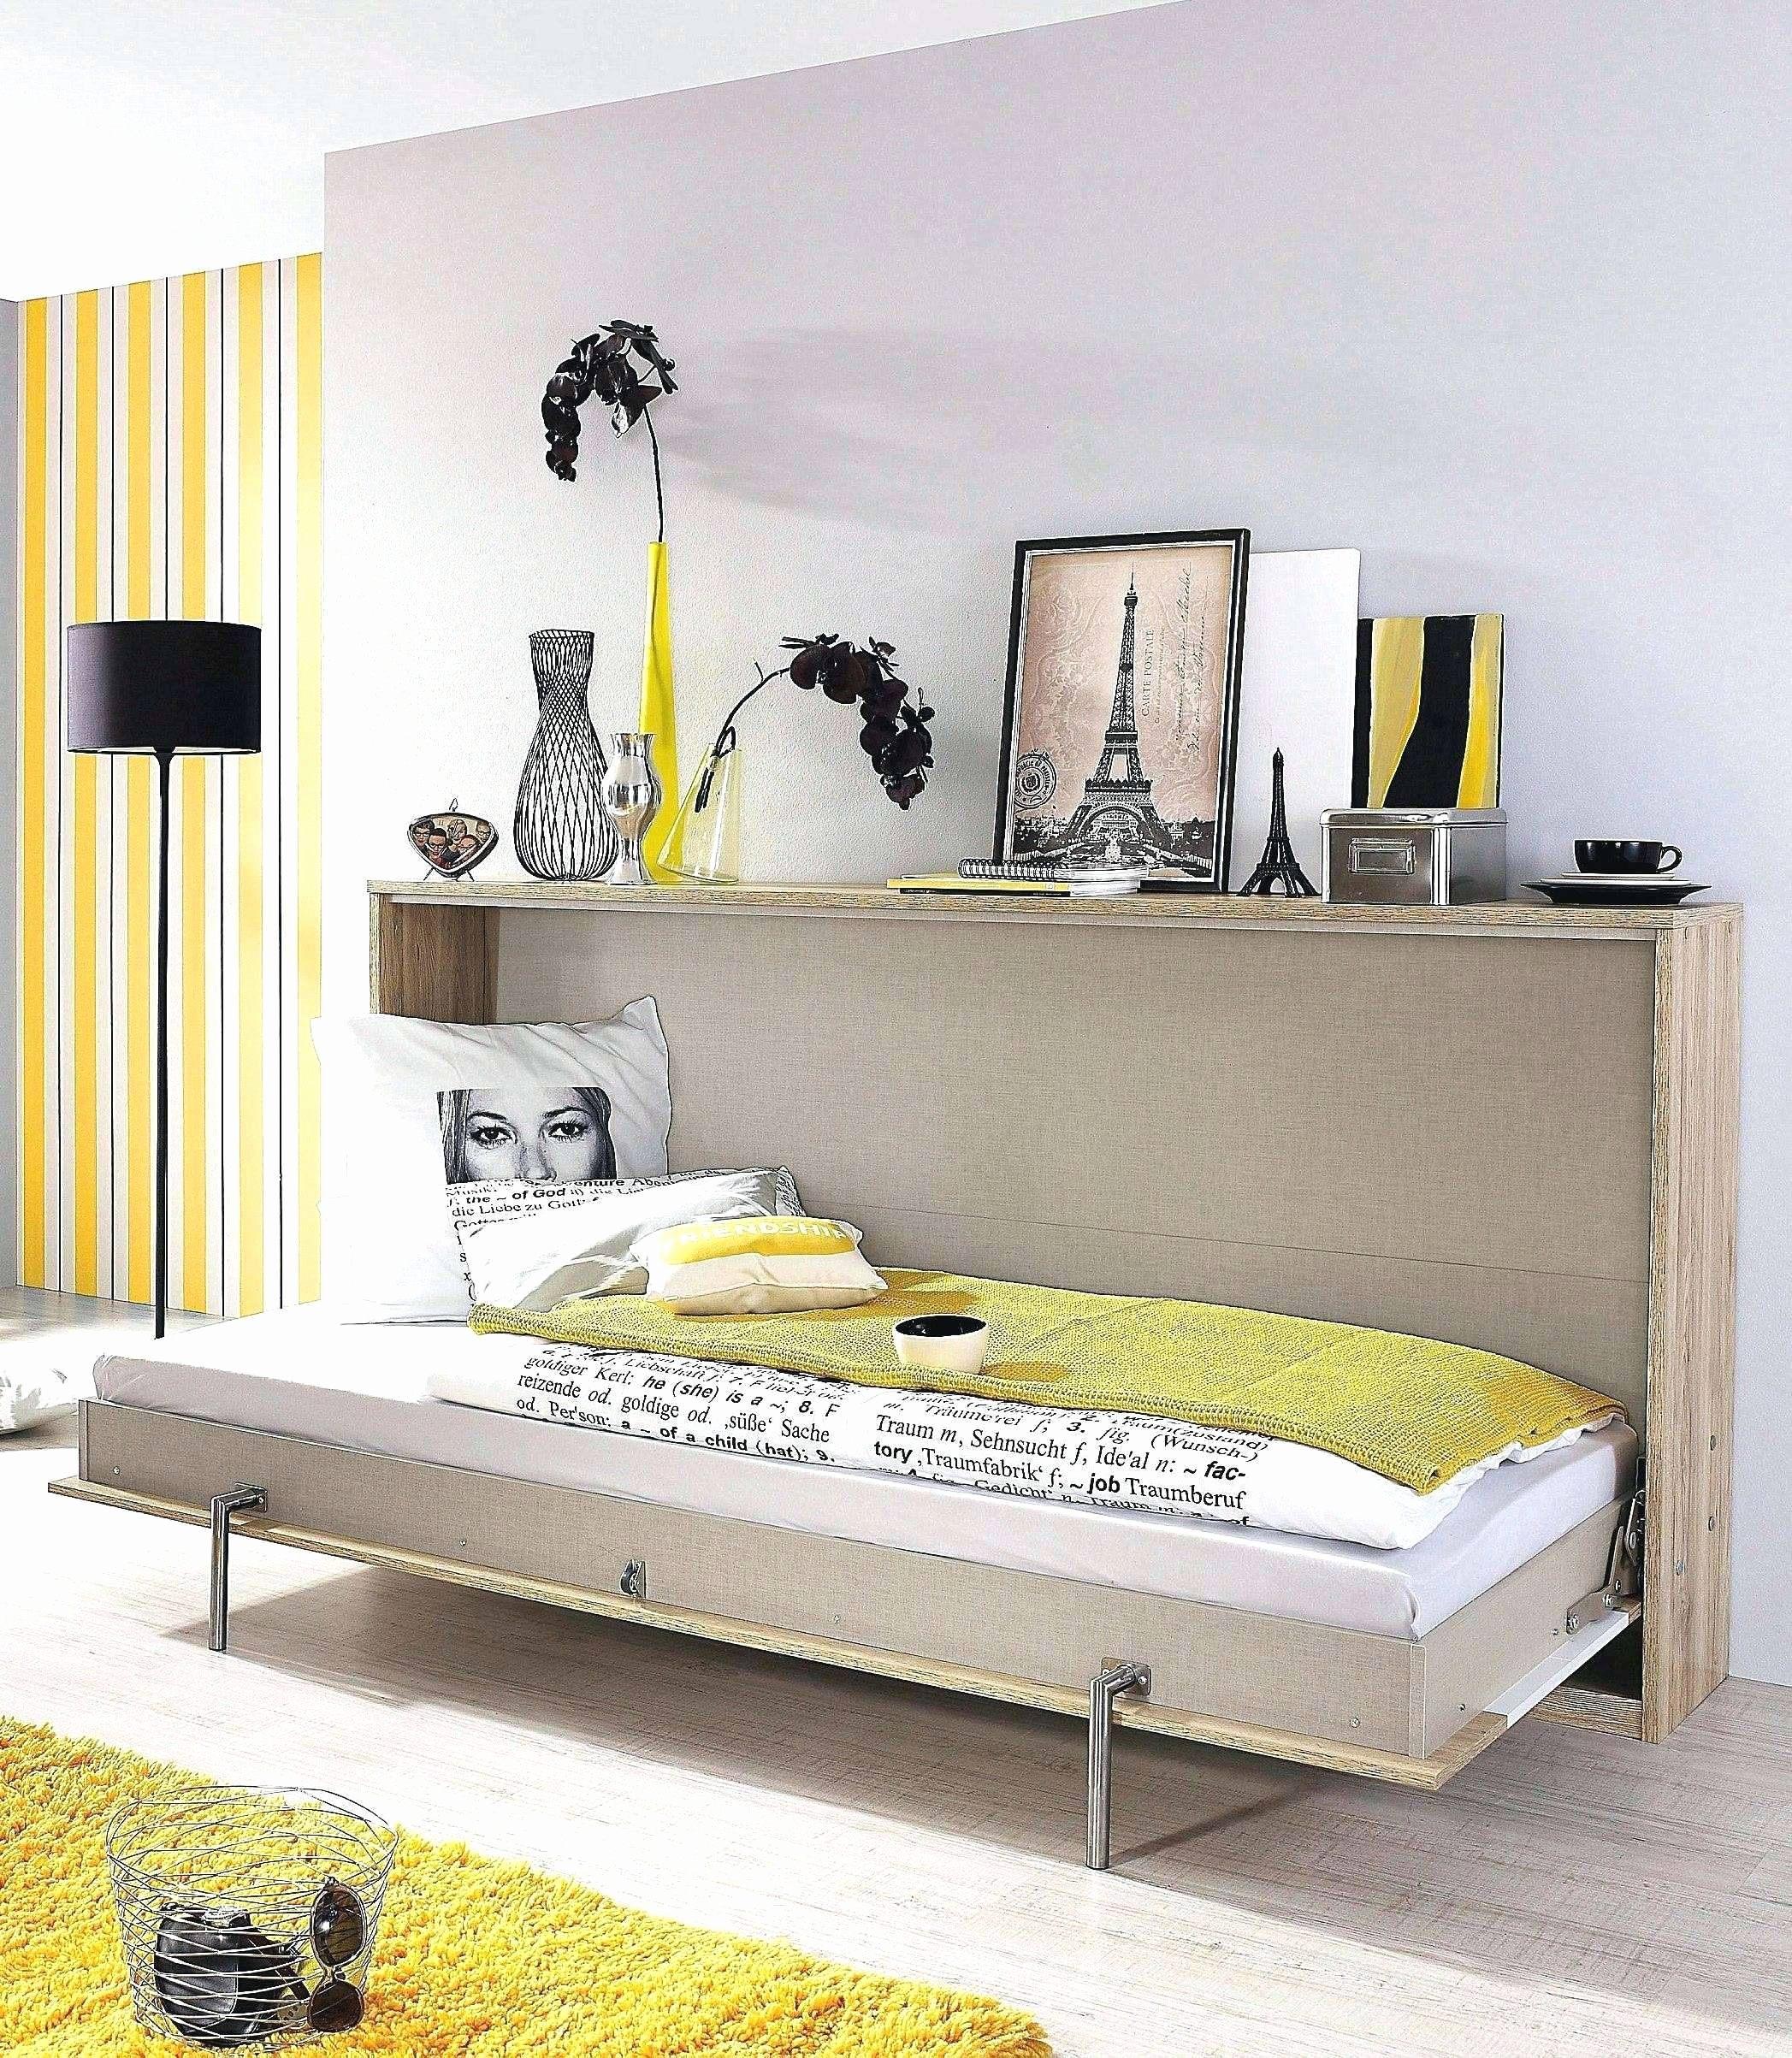 Lit Baldaquin 160×200 Magnifique Matelas Ikea 160—200 Beau Lit A Tiroir Ikea Cadre De Lit Trysil